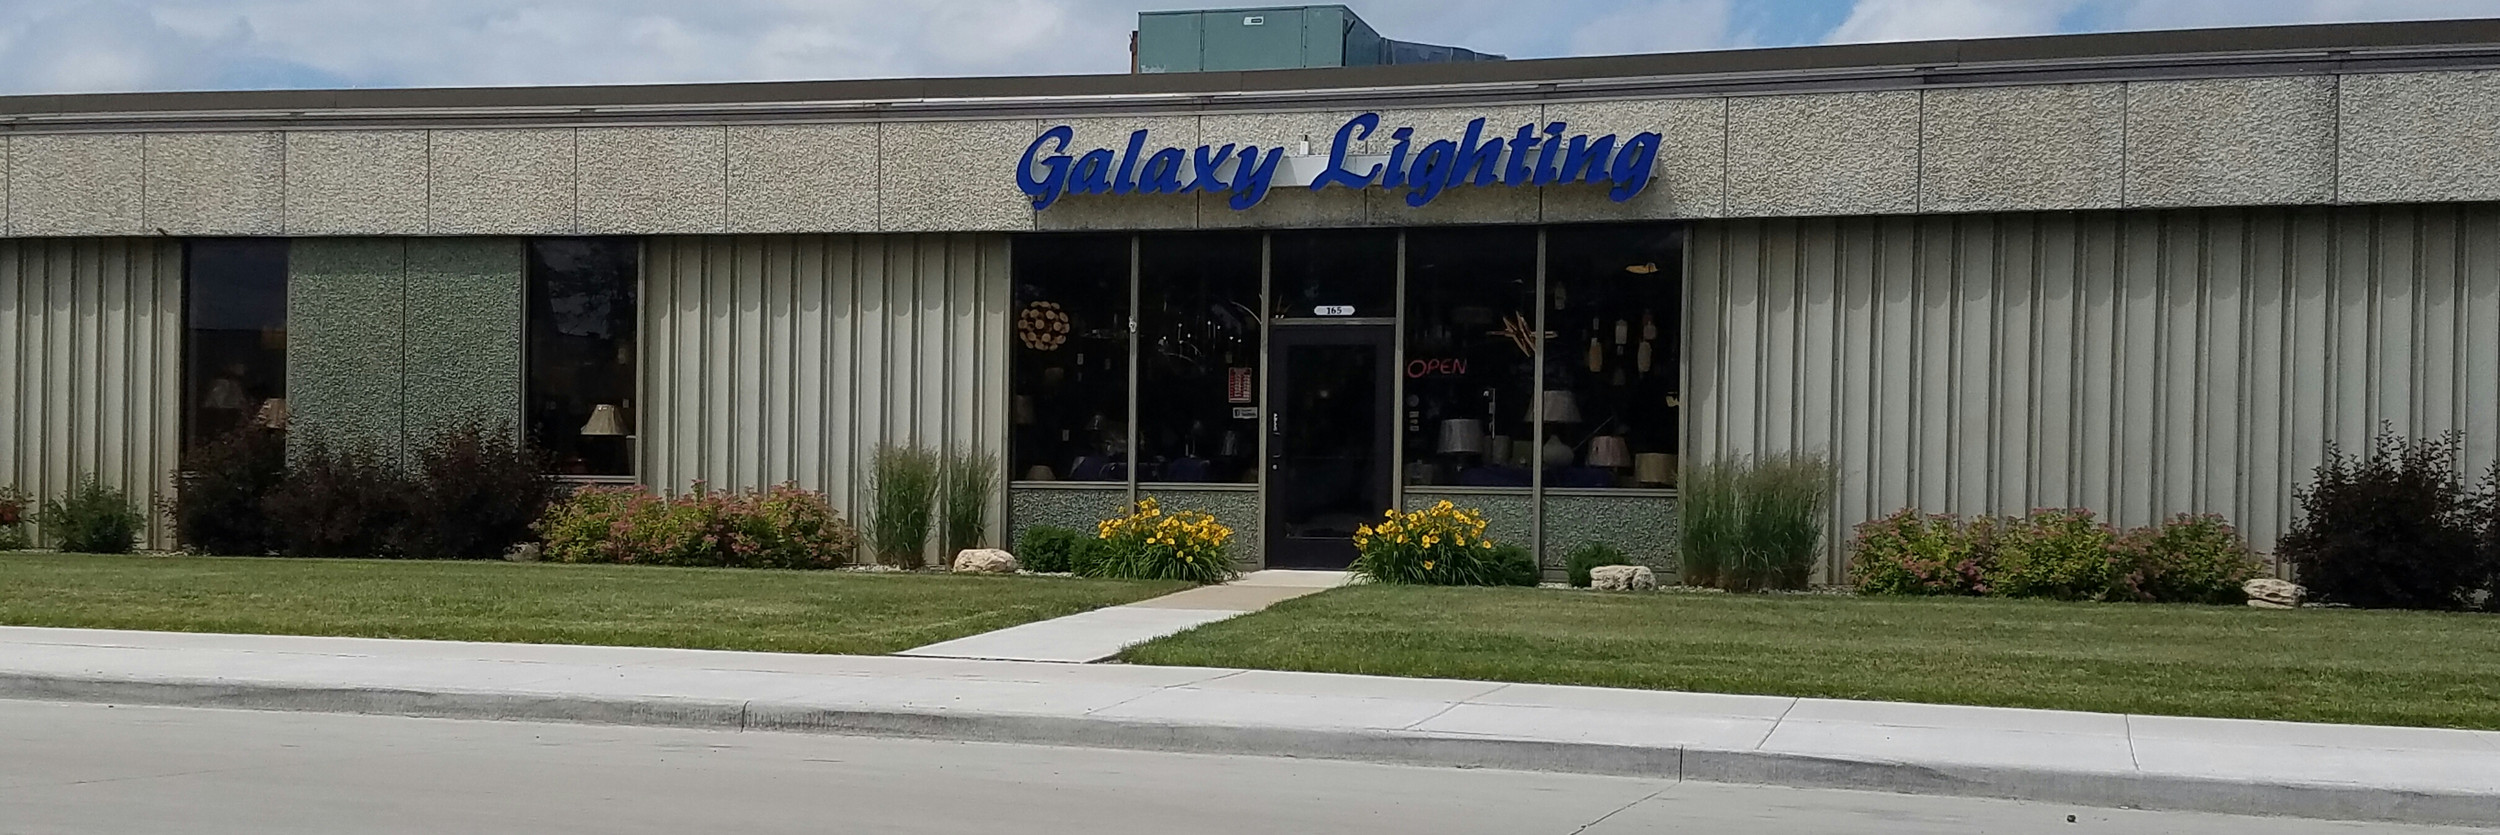 Lighting Fond Du Lac Galaxy